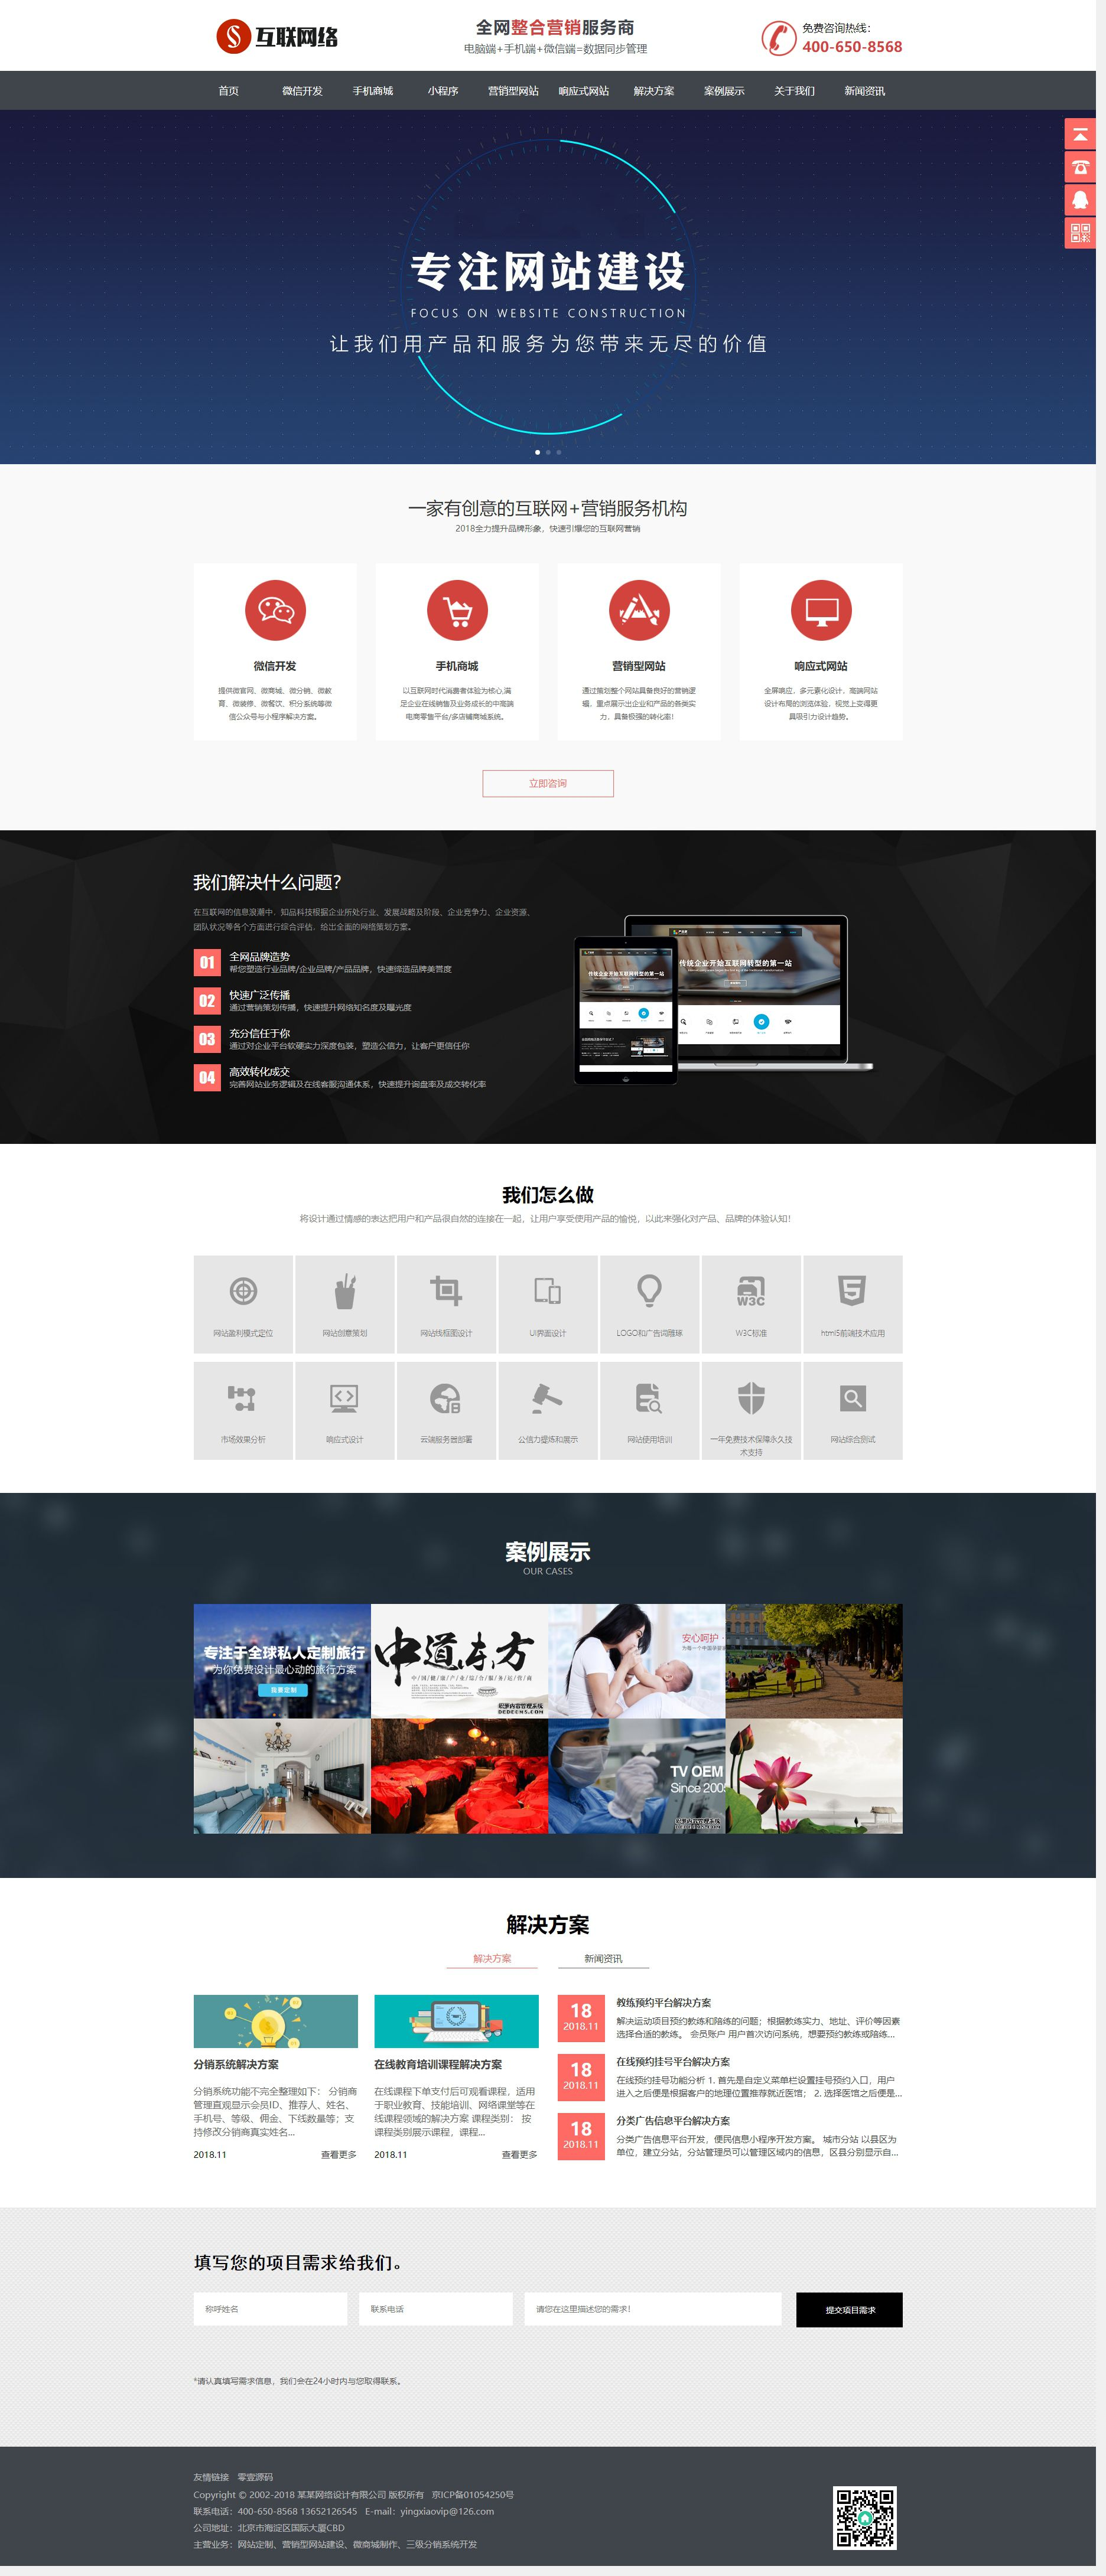 HTML5响应式营销网站定制公司织梦dedecms模板(支持移动设备)